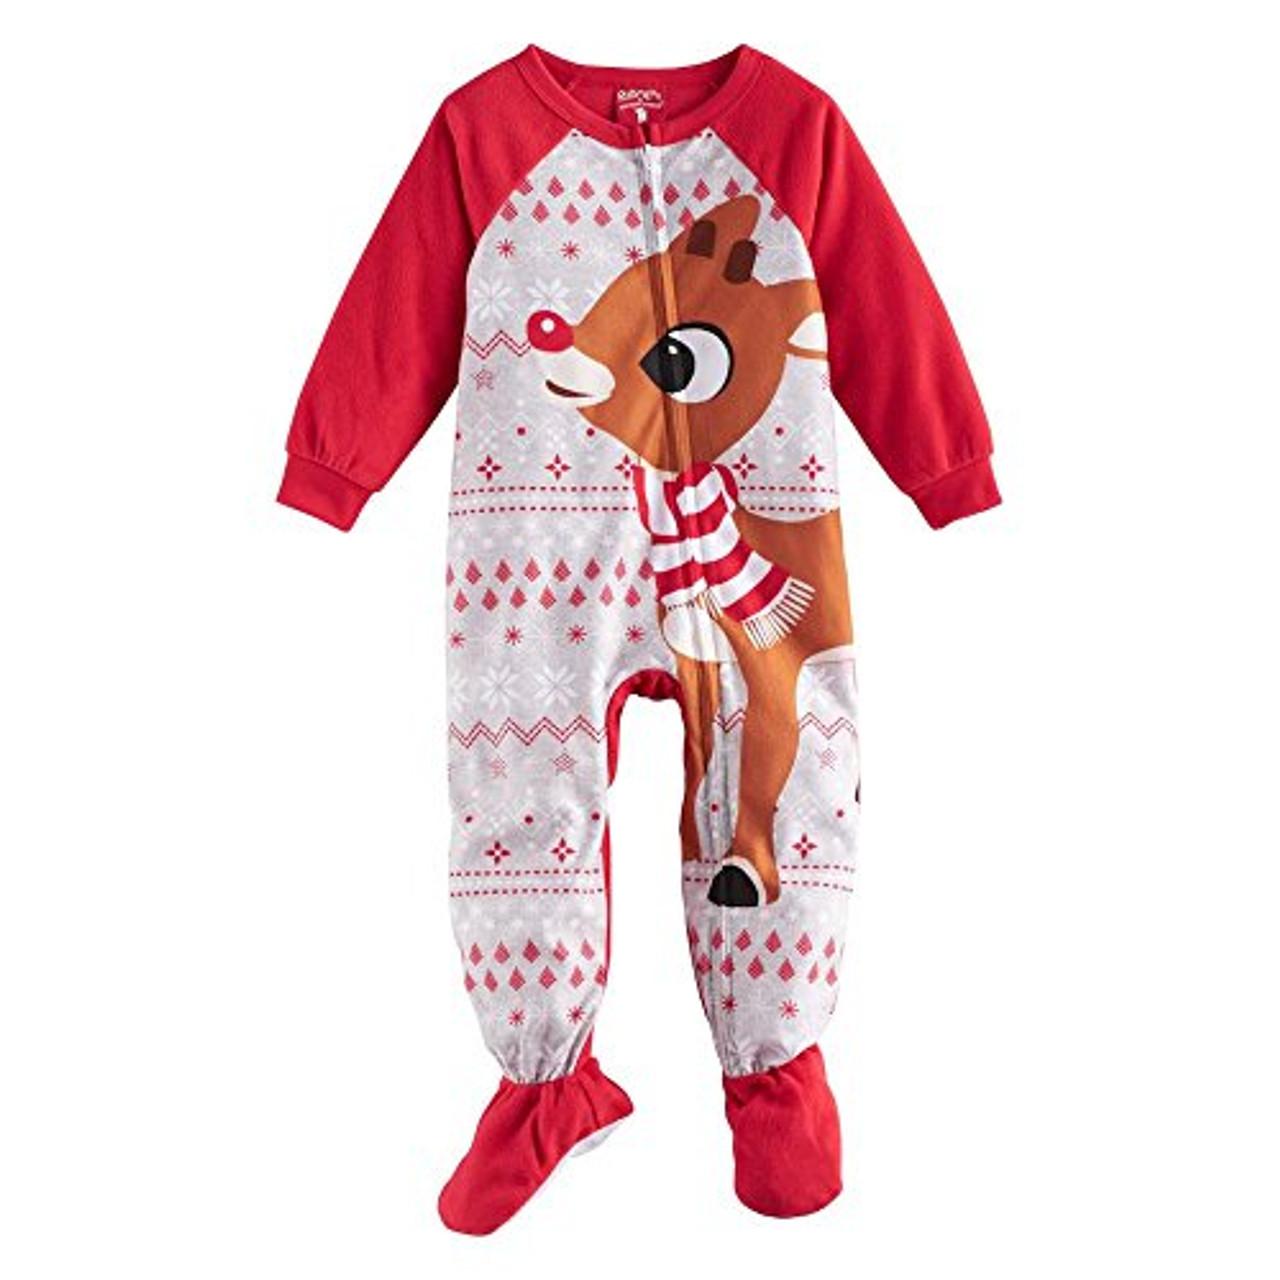 Rudolph The Red-Nosed Reindeer Christmas Fleece Blanket Pajama Sleeper